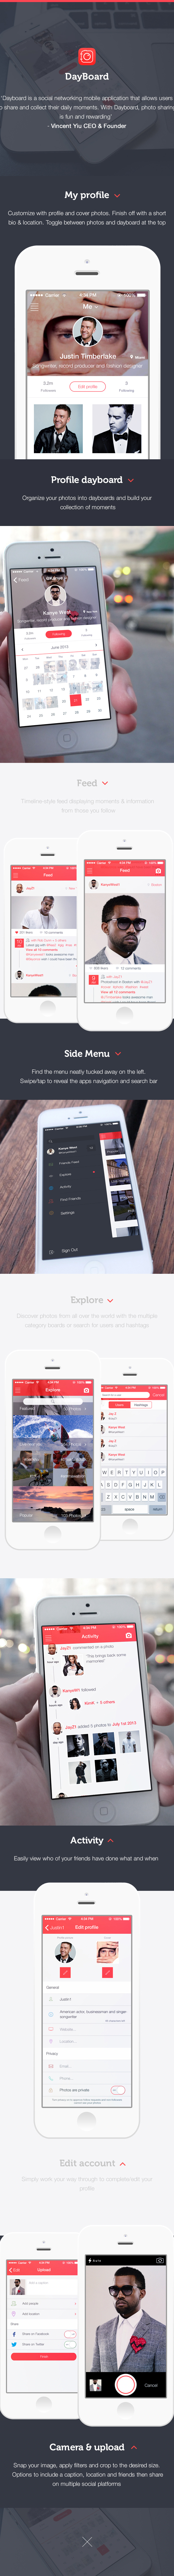 ios7 UI ux profile photos sharing social network Interface screen visual